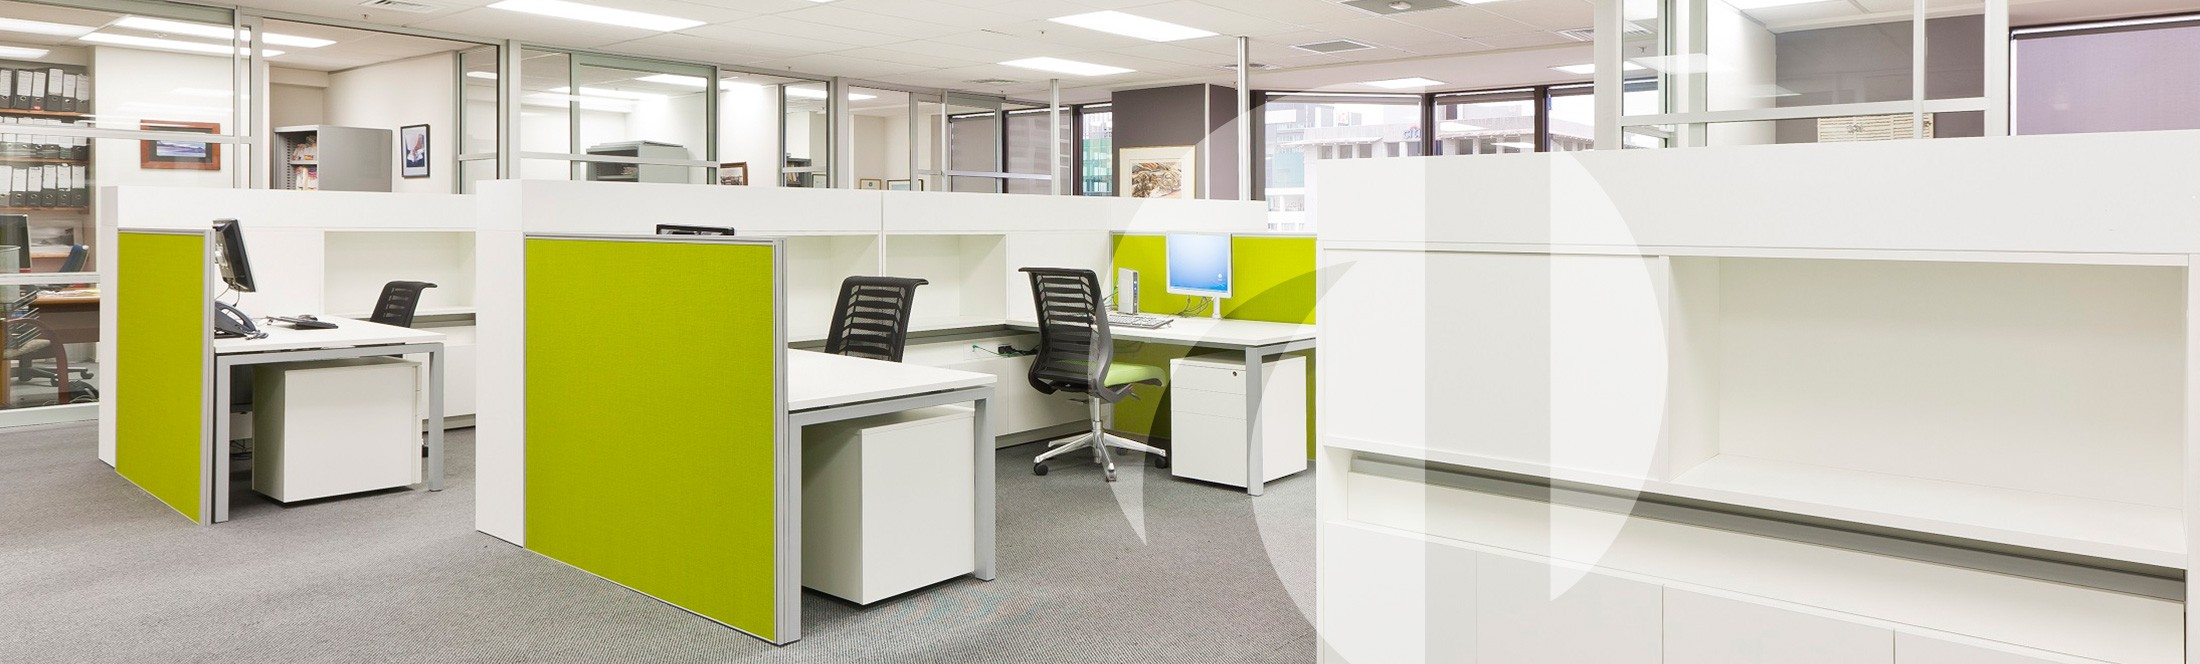 Office Furniture Office FitOuts Damen Office Furniture